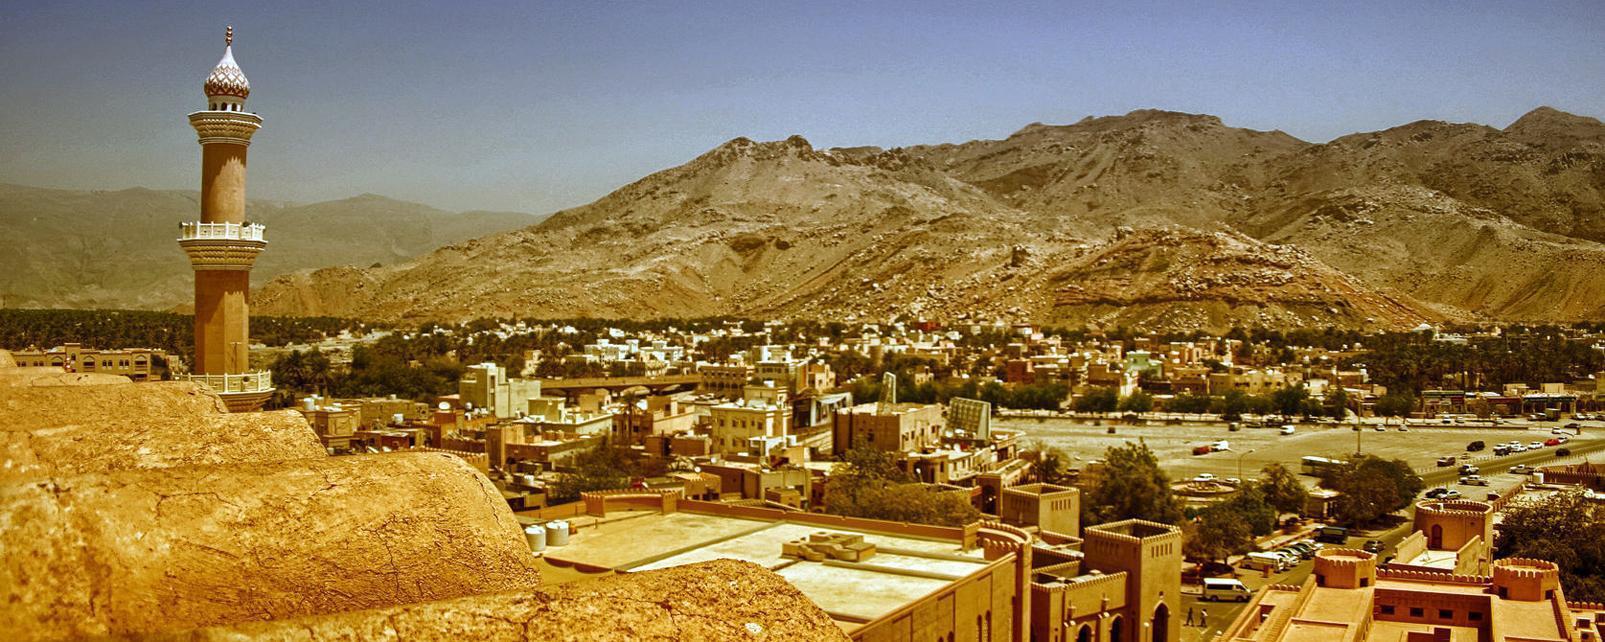 Moyen-Orient; Sultanat d'Oman; Nizwa;